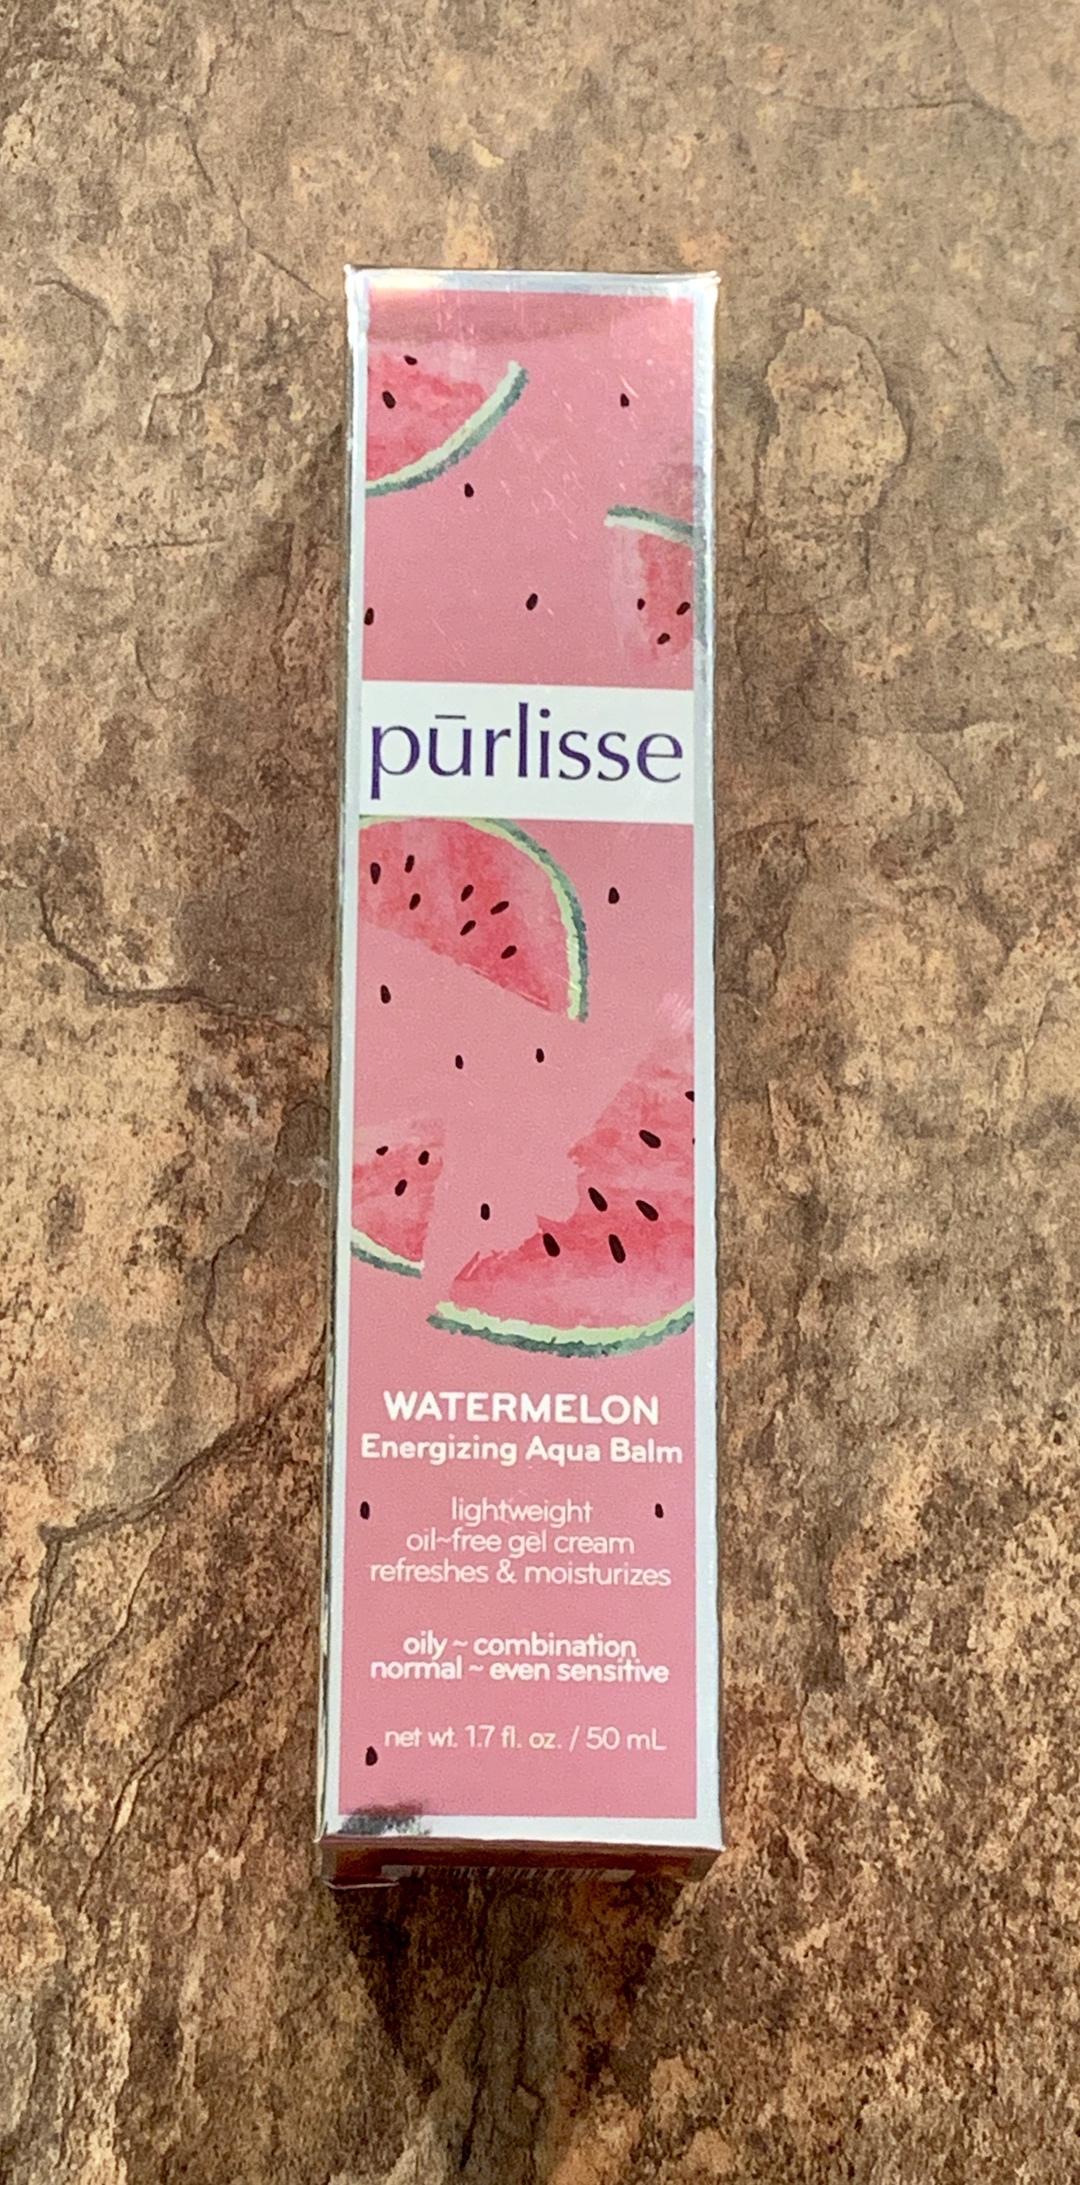 Purlisse Watermelon Energizing Aqua Balm